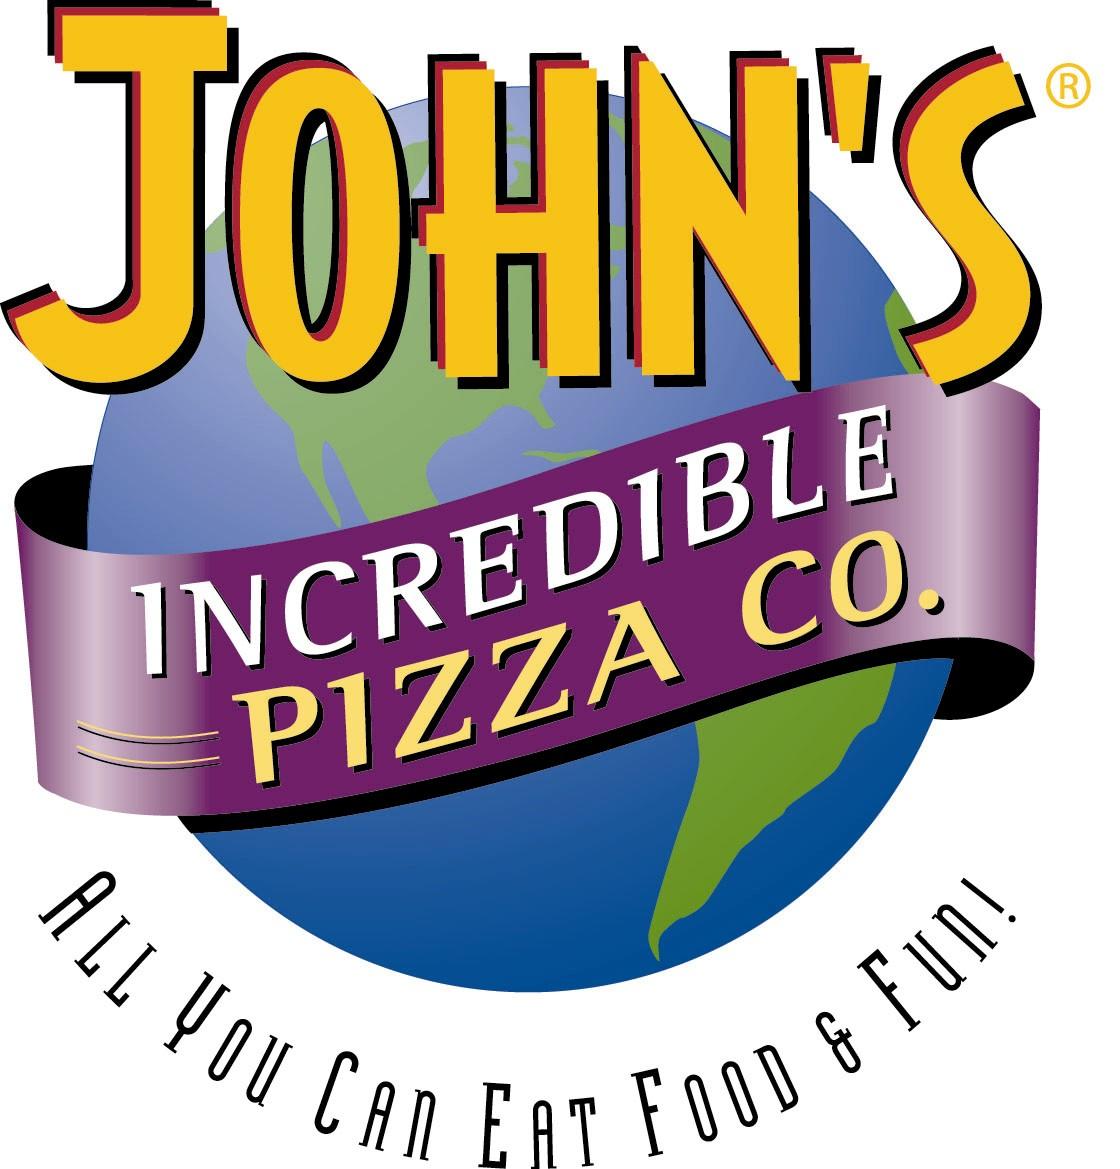 john s incredible pizza company